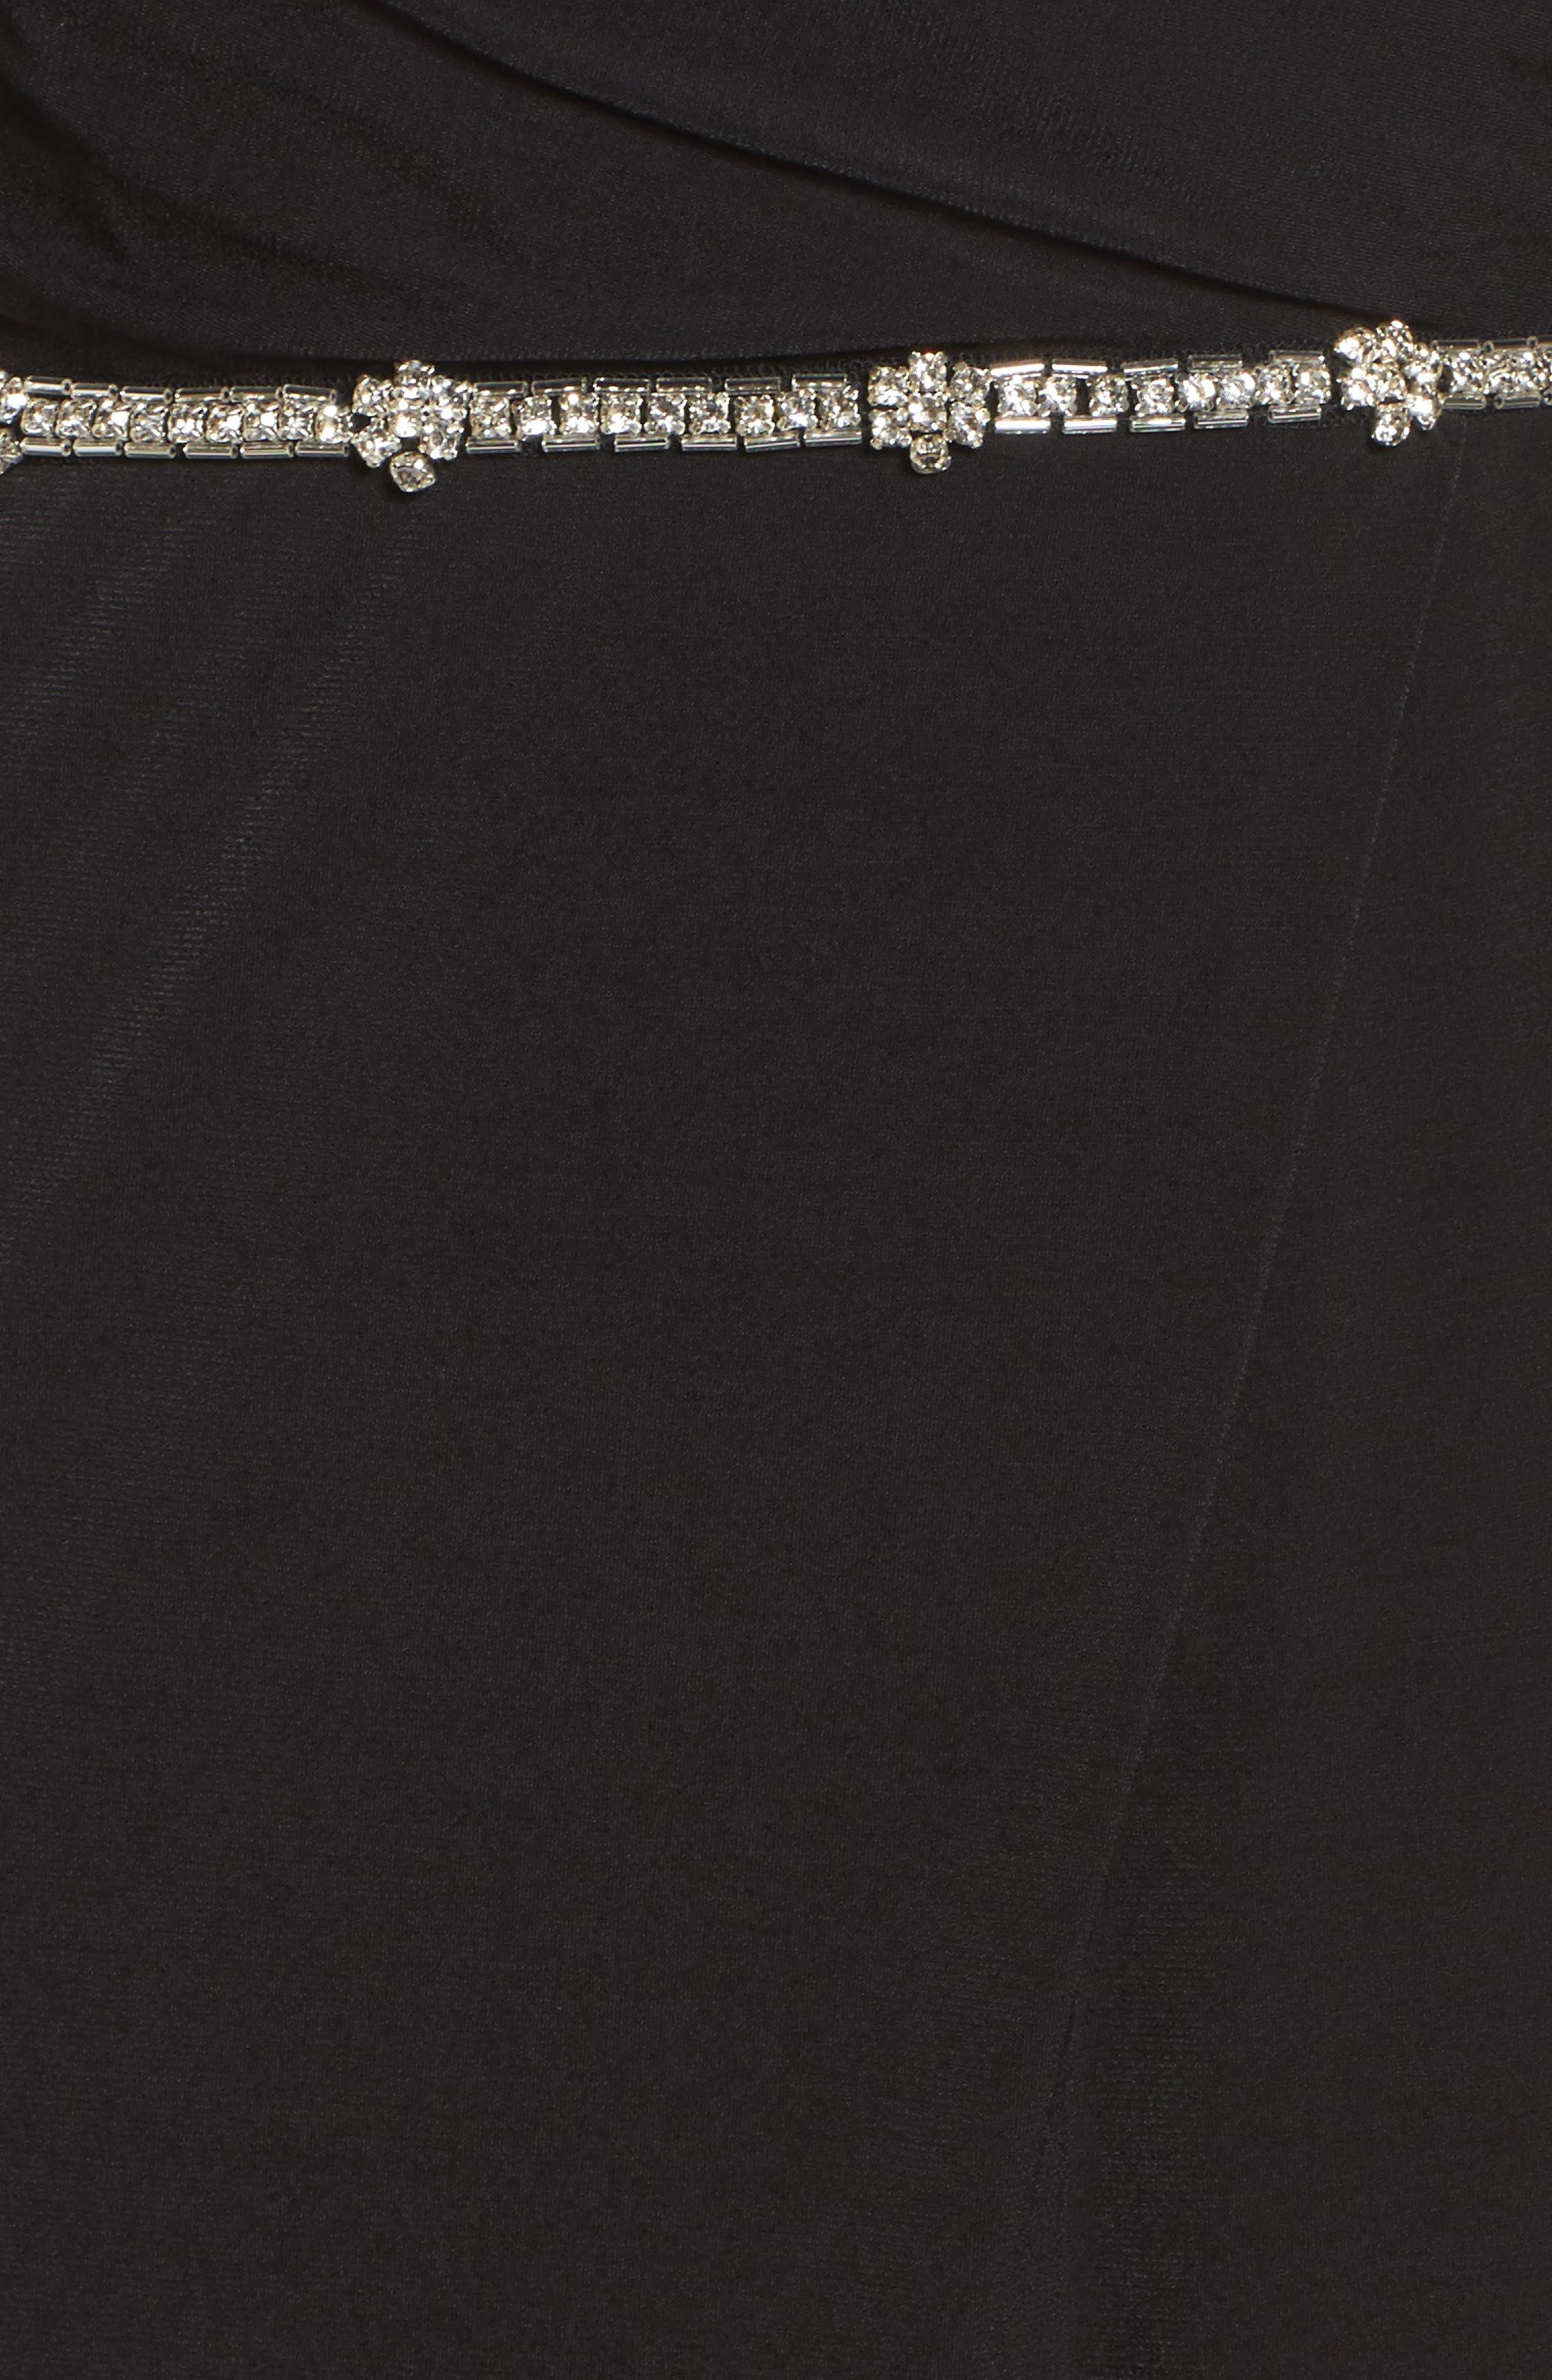 Embellished Drape Back Gown,                             Alternate thumbnail 5, color,                             001